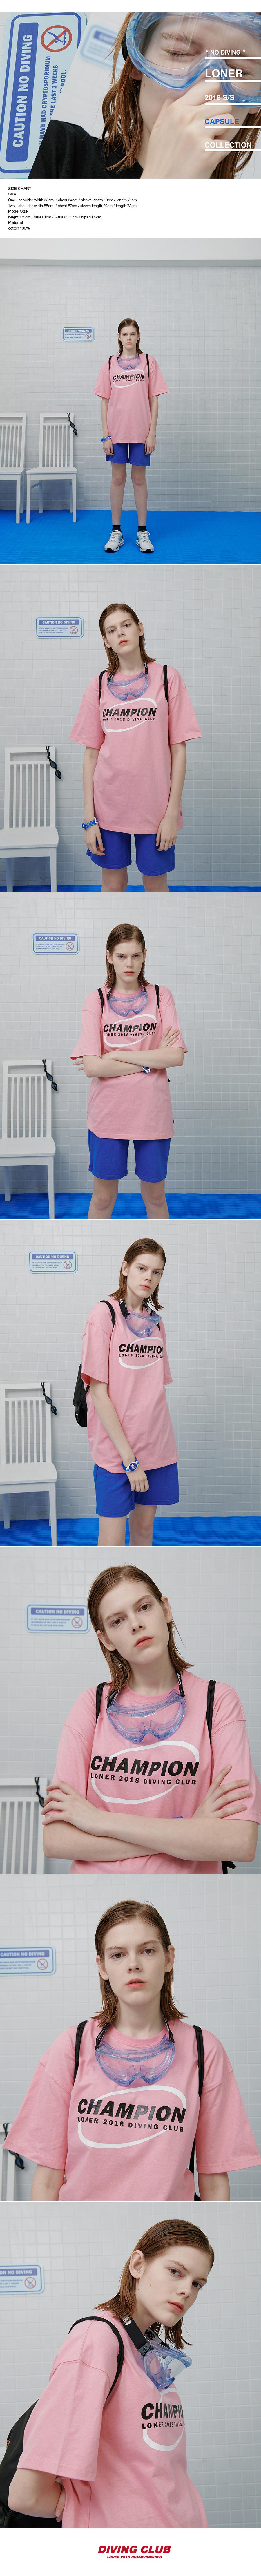 Circle diver tshirt-pink.jpg